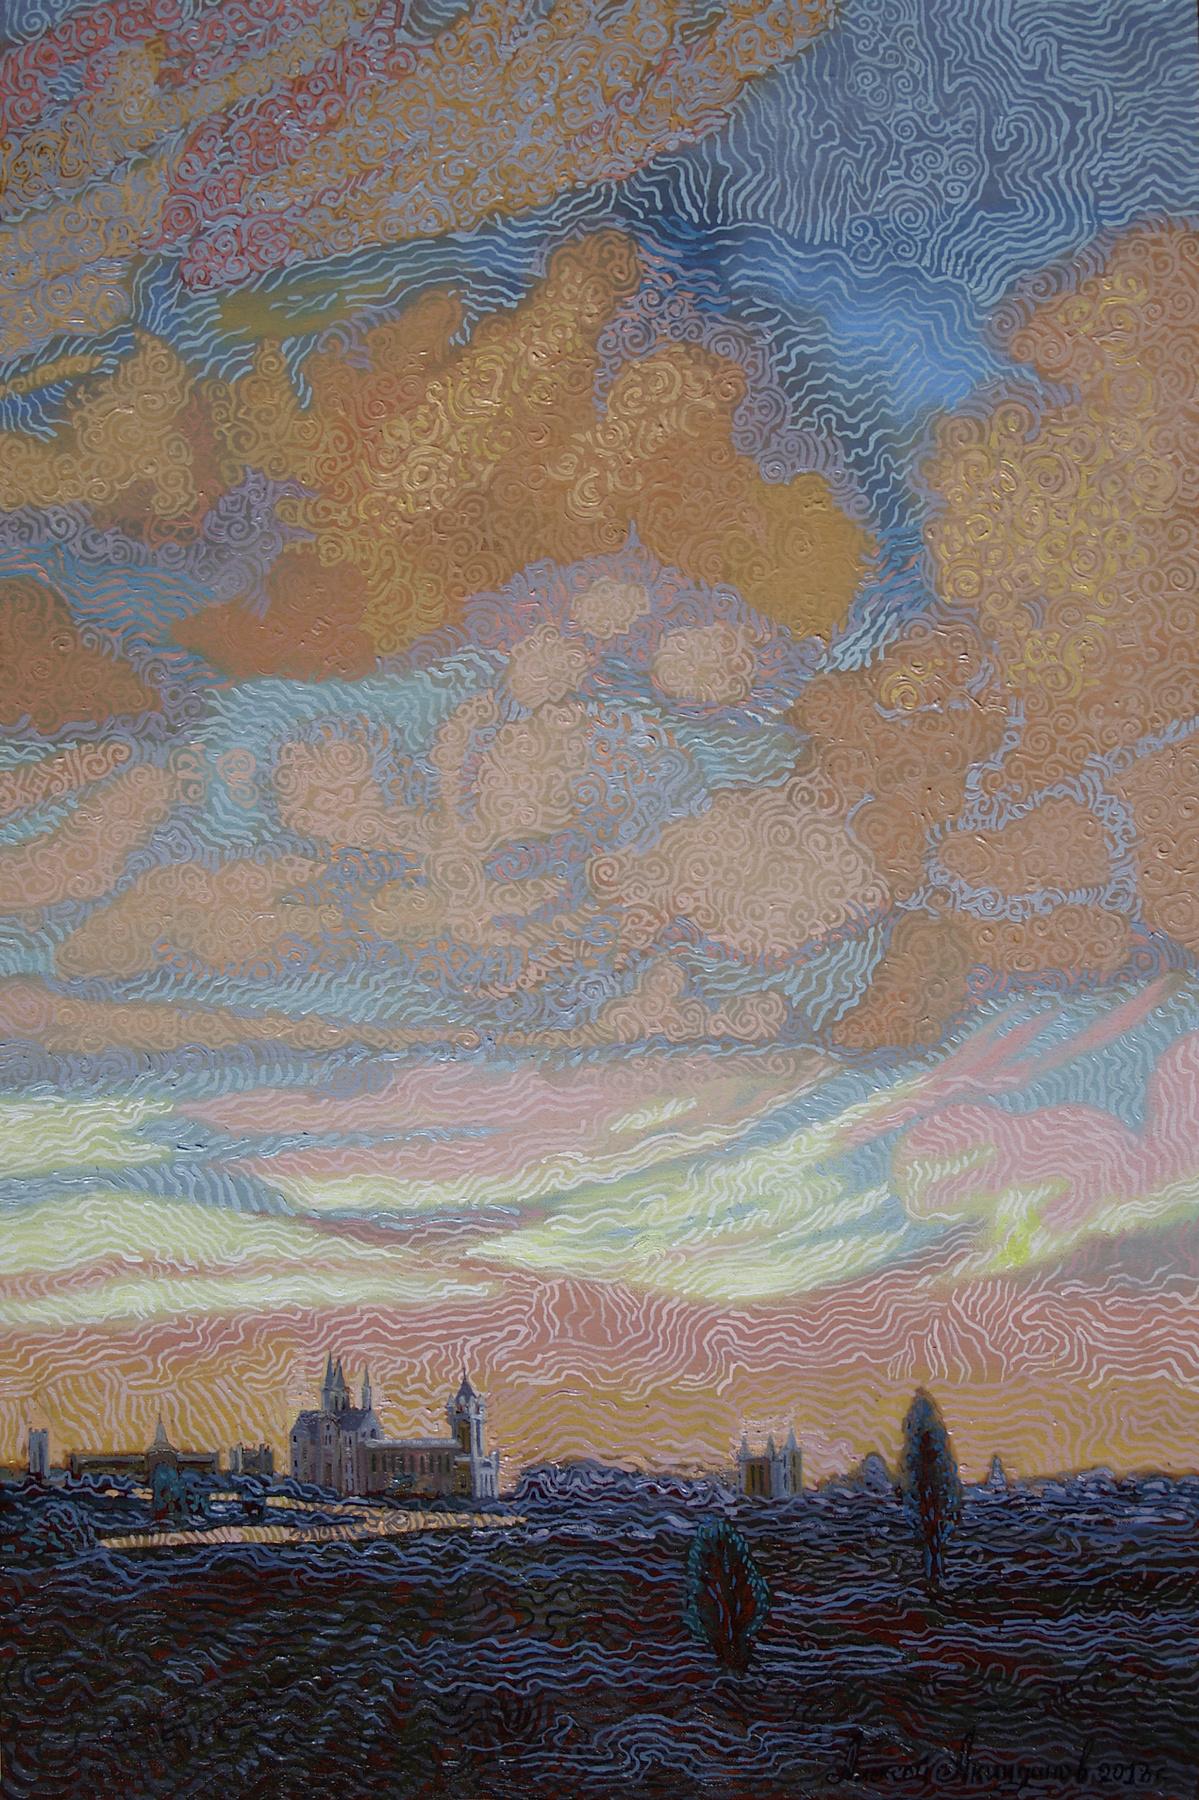 Алексей Петрович Акиндинов. The sky is one for all